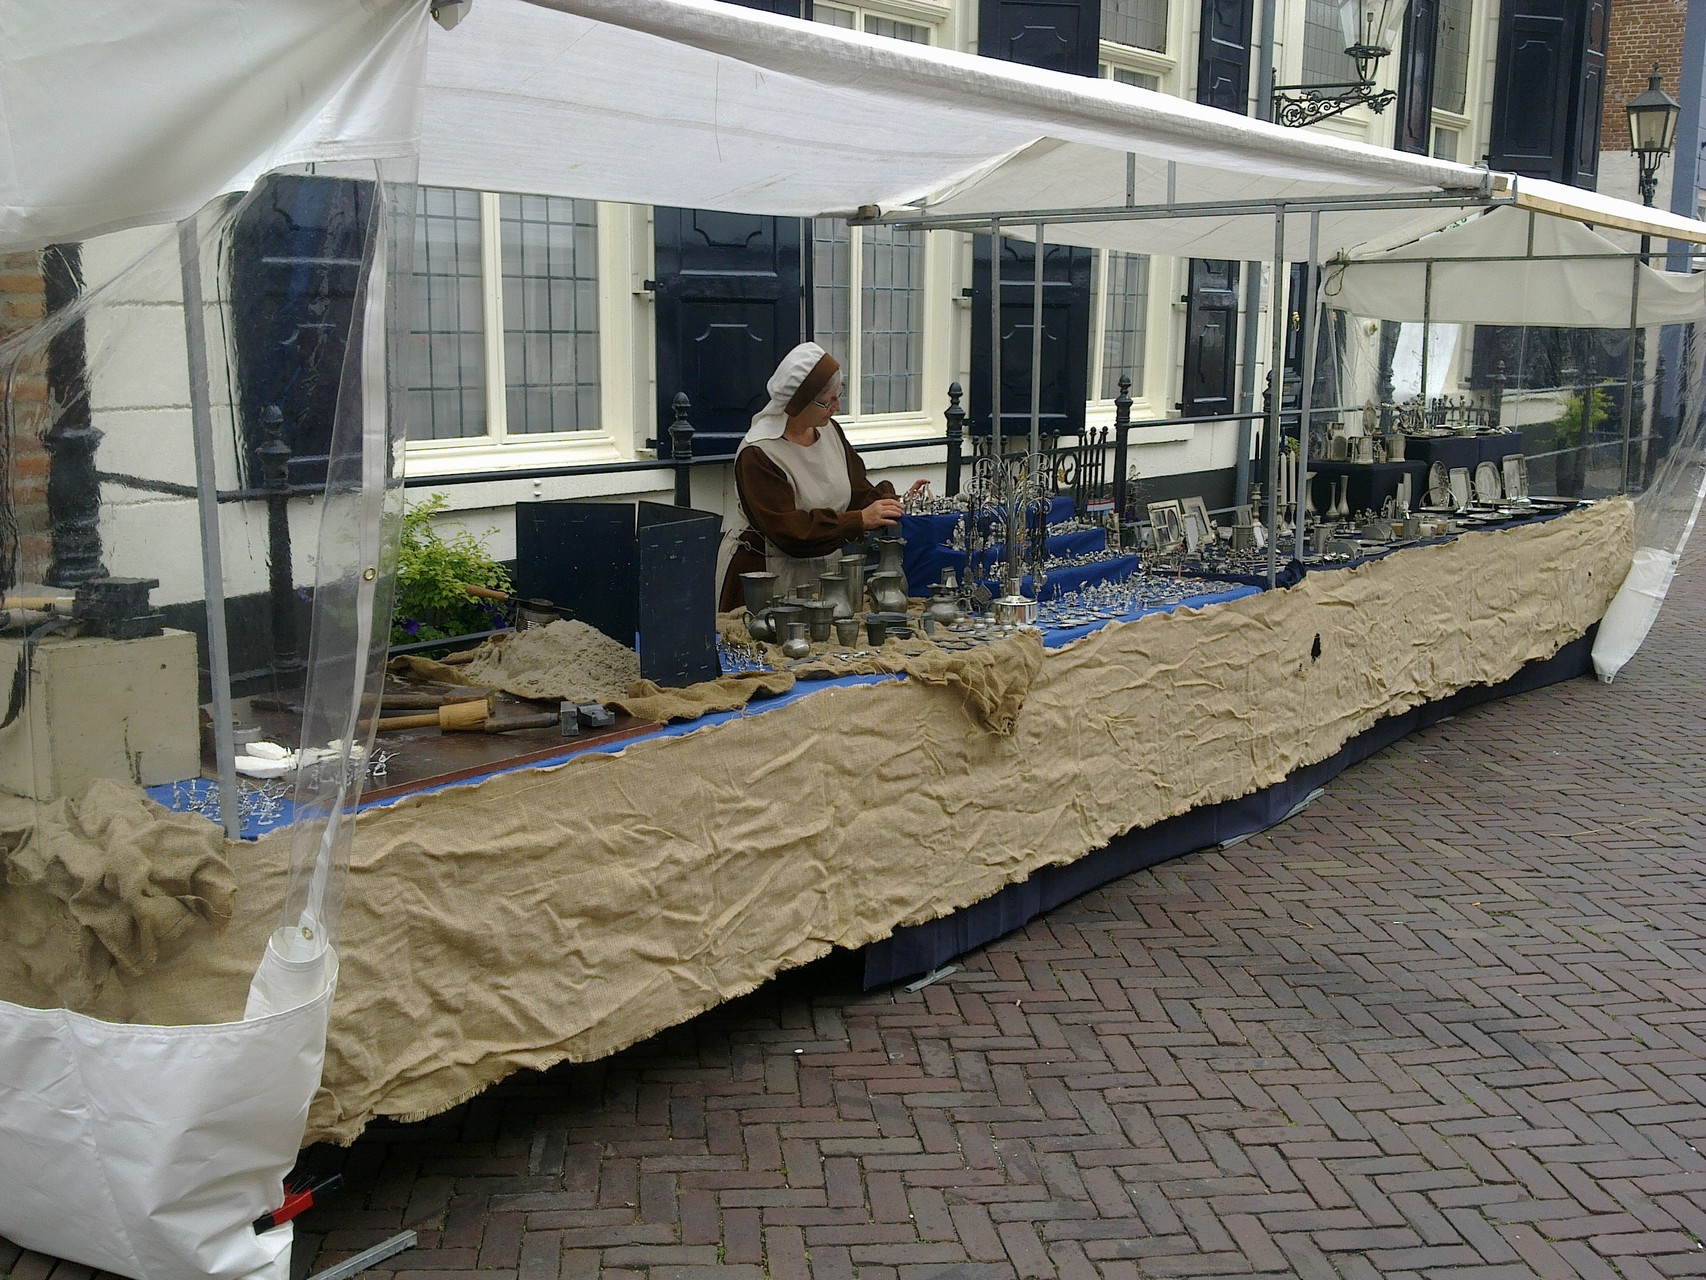 Markt middeleeuwse aankleding (Doesburg 2015)